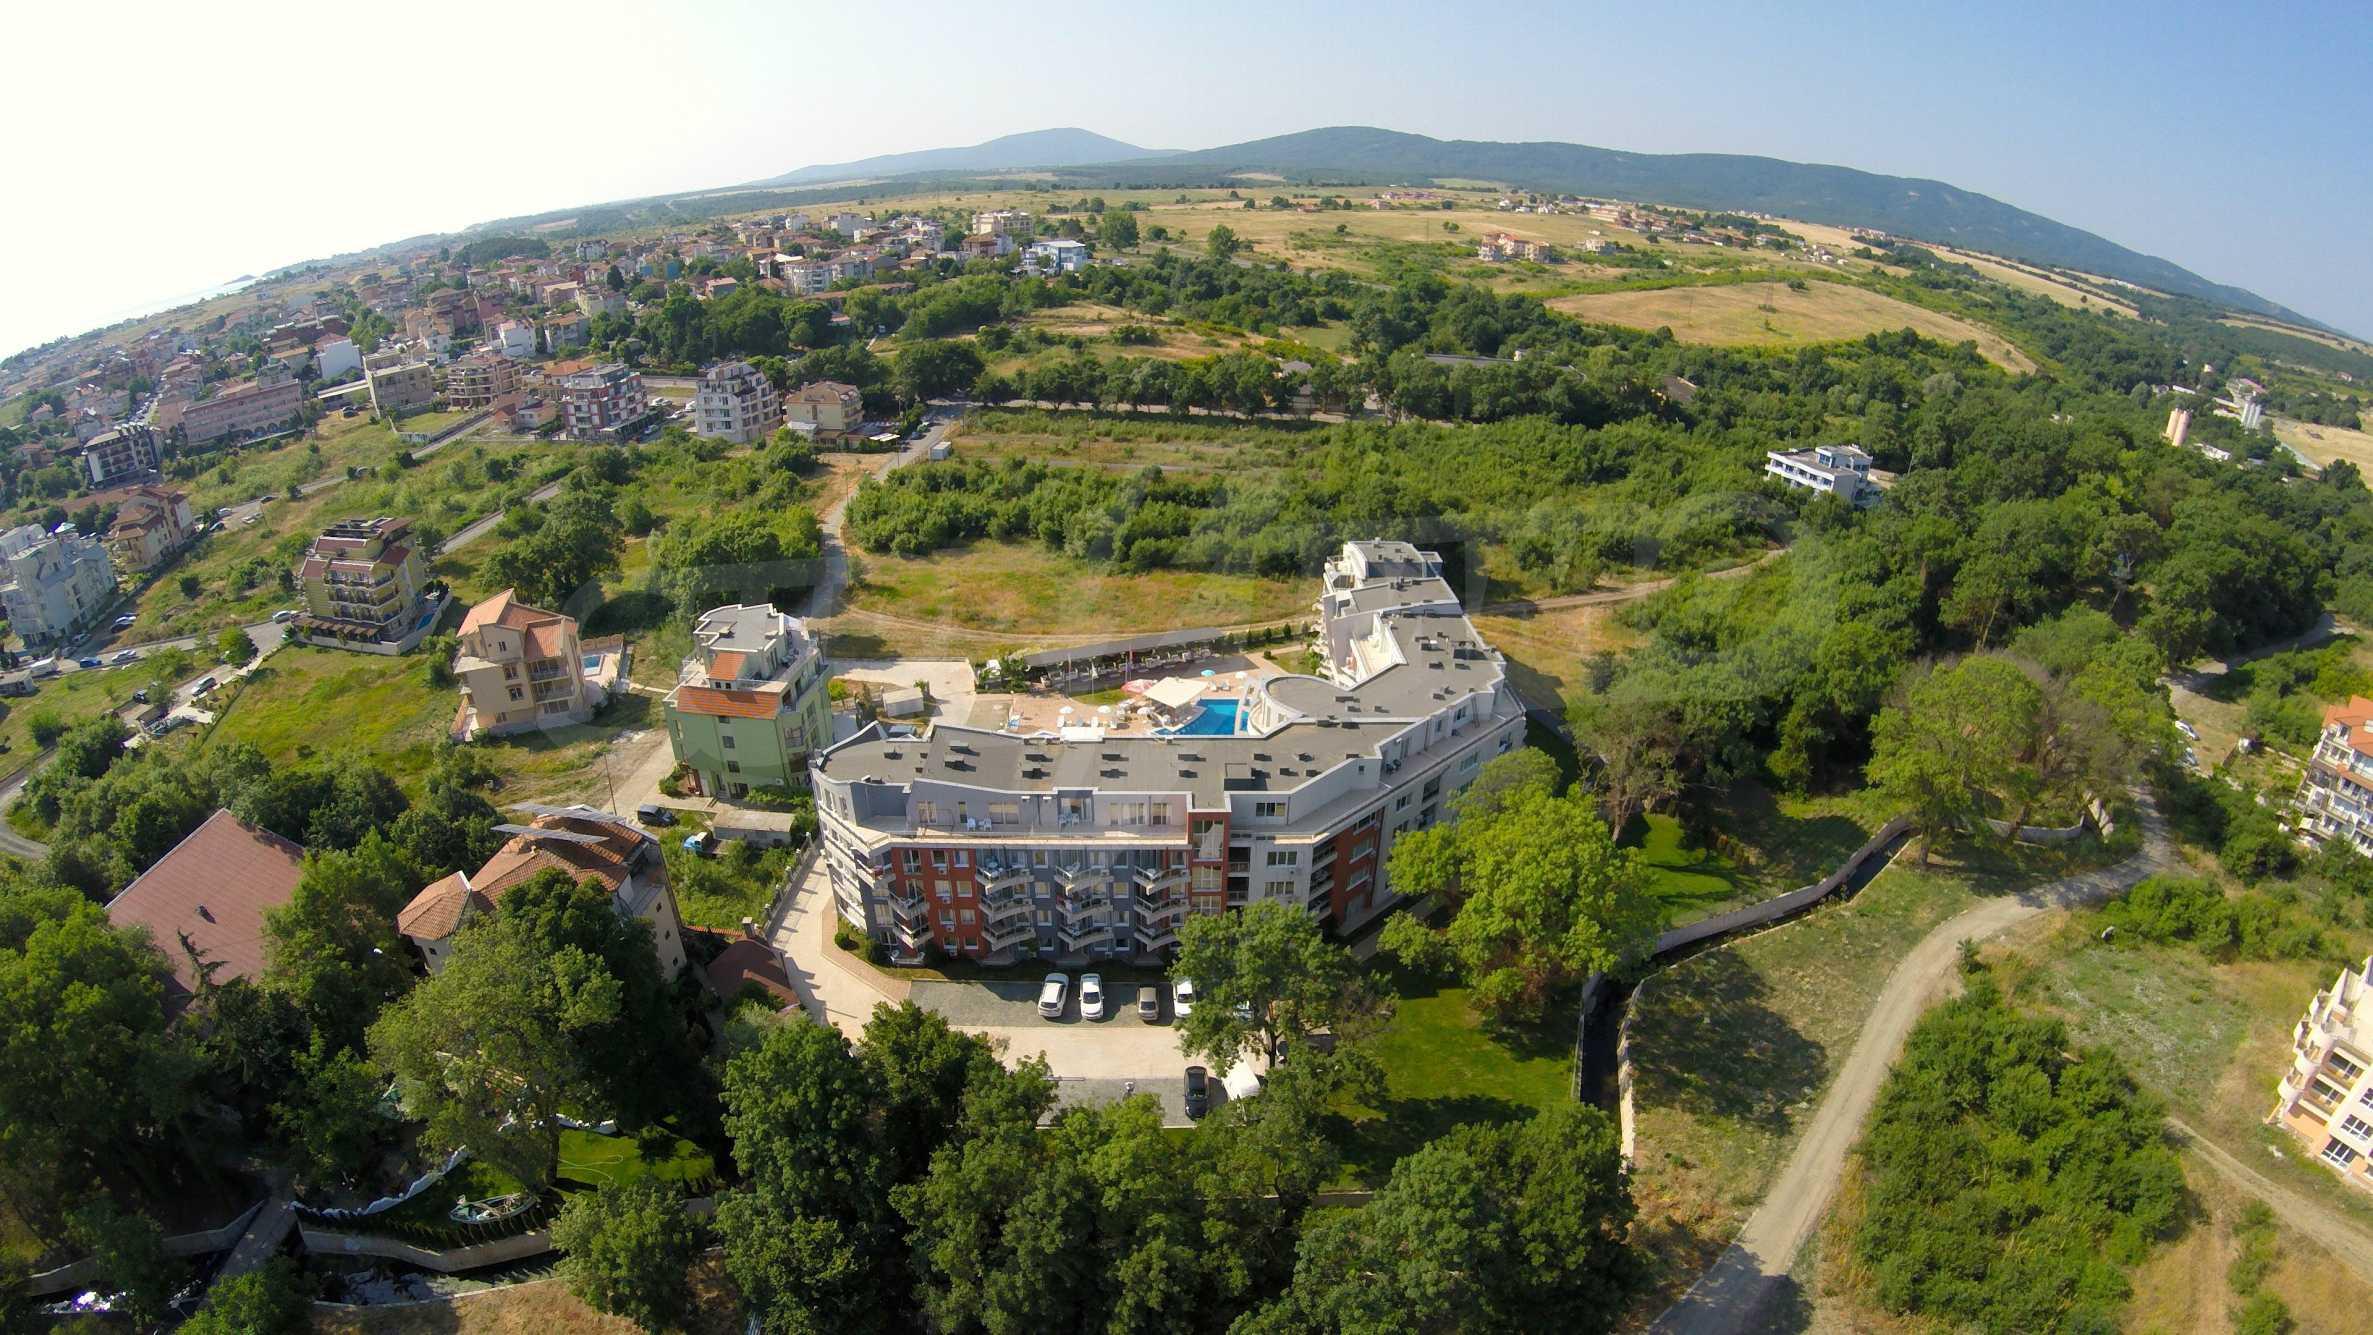 Трехкомнатный апартамент на продажу в комплексе Emberli в курорте Лозенец 29